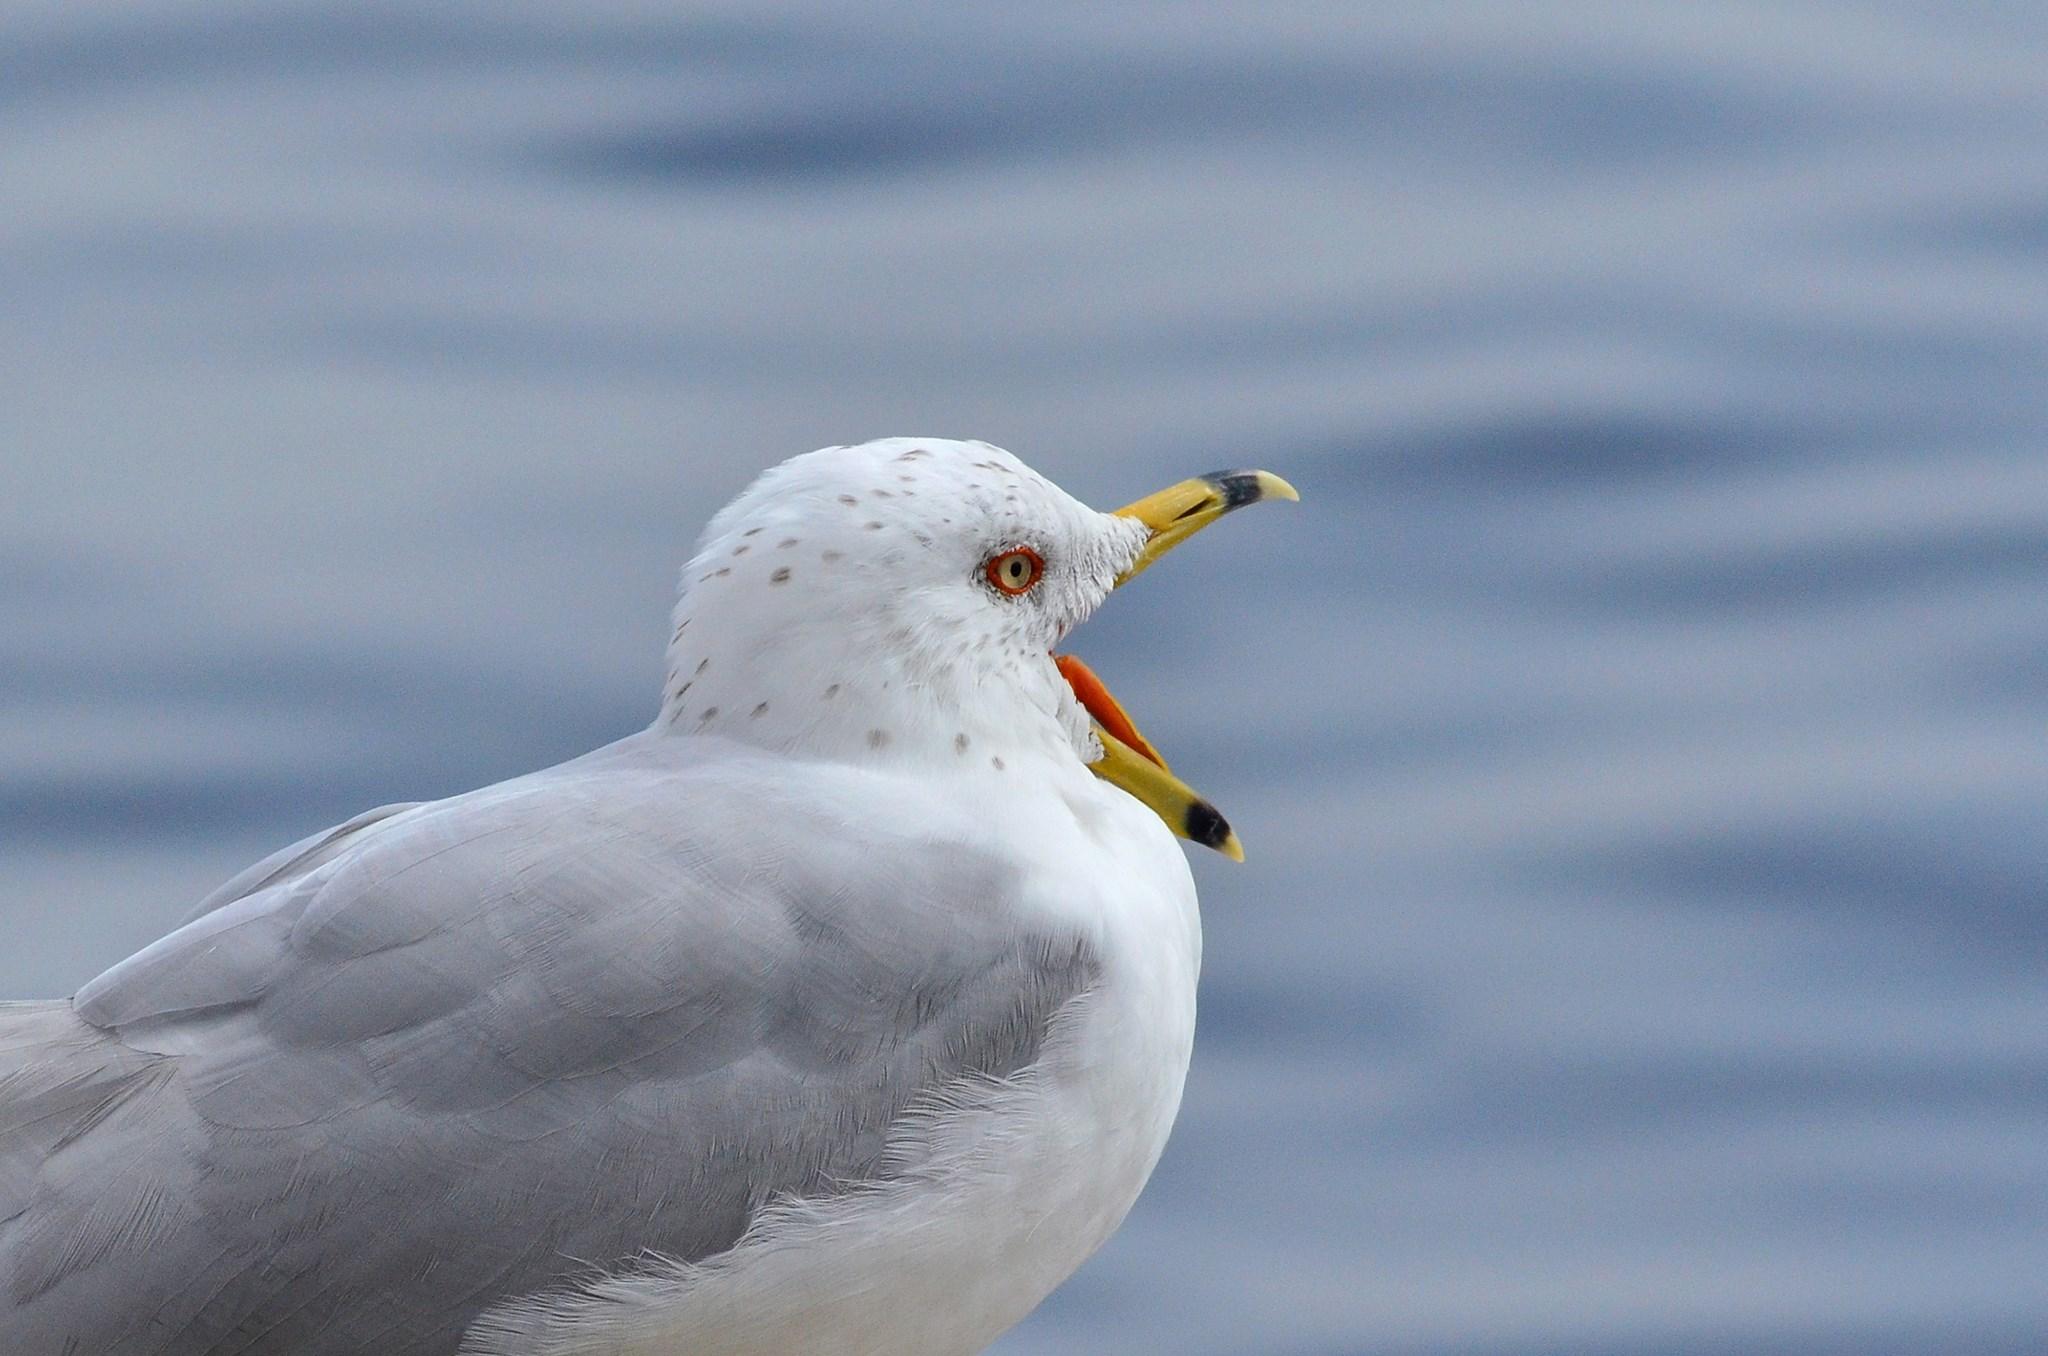 Ring-billed gull (Photo by Christian Schwarz)